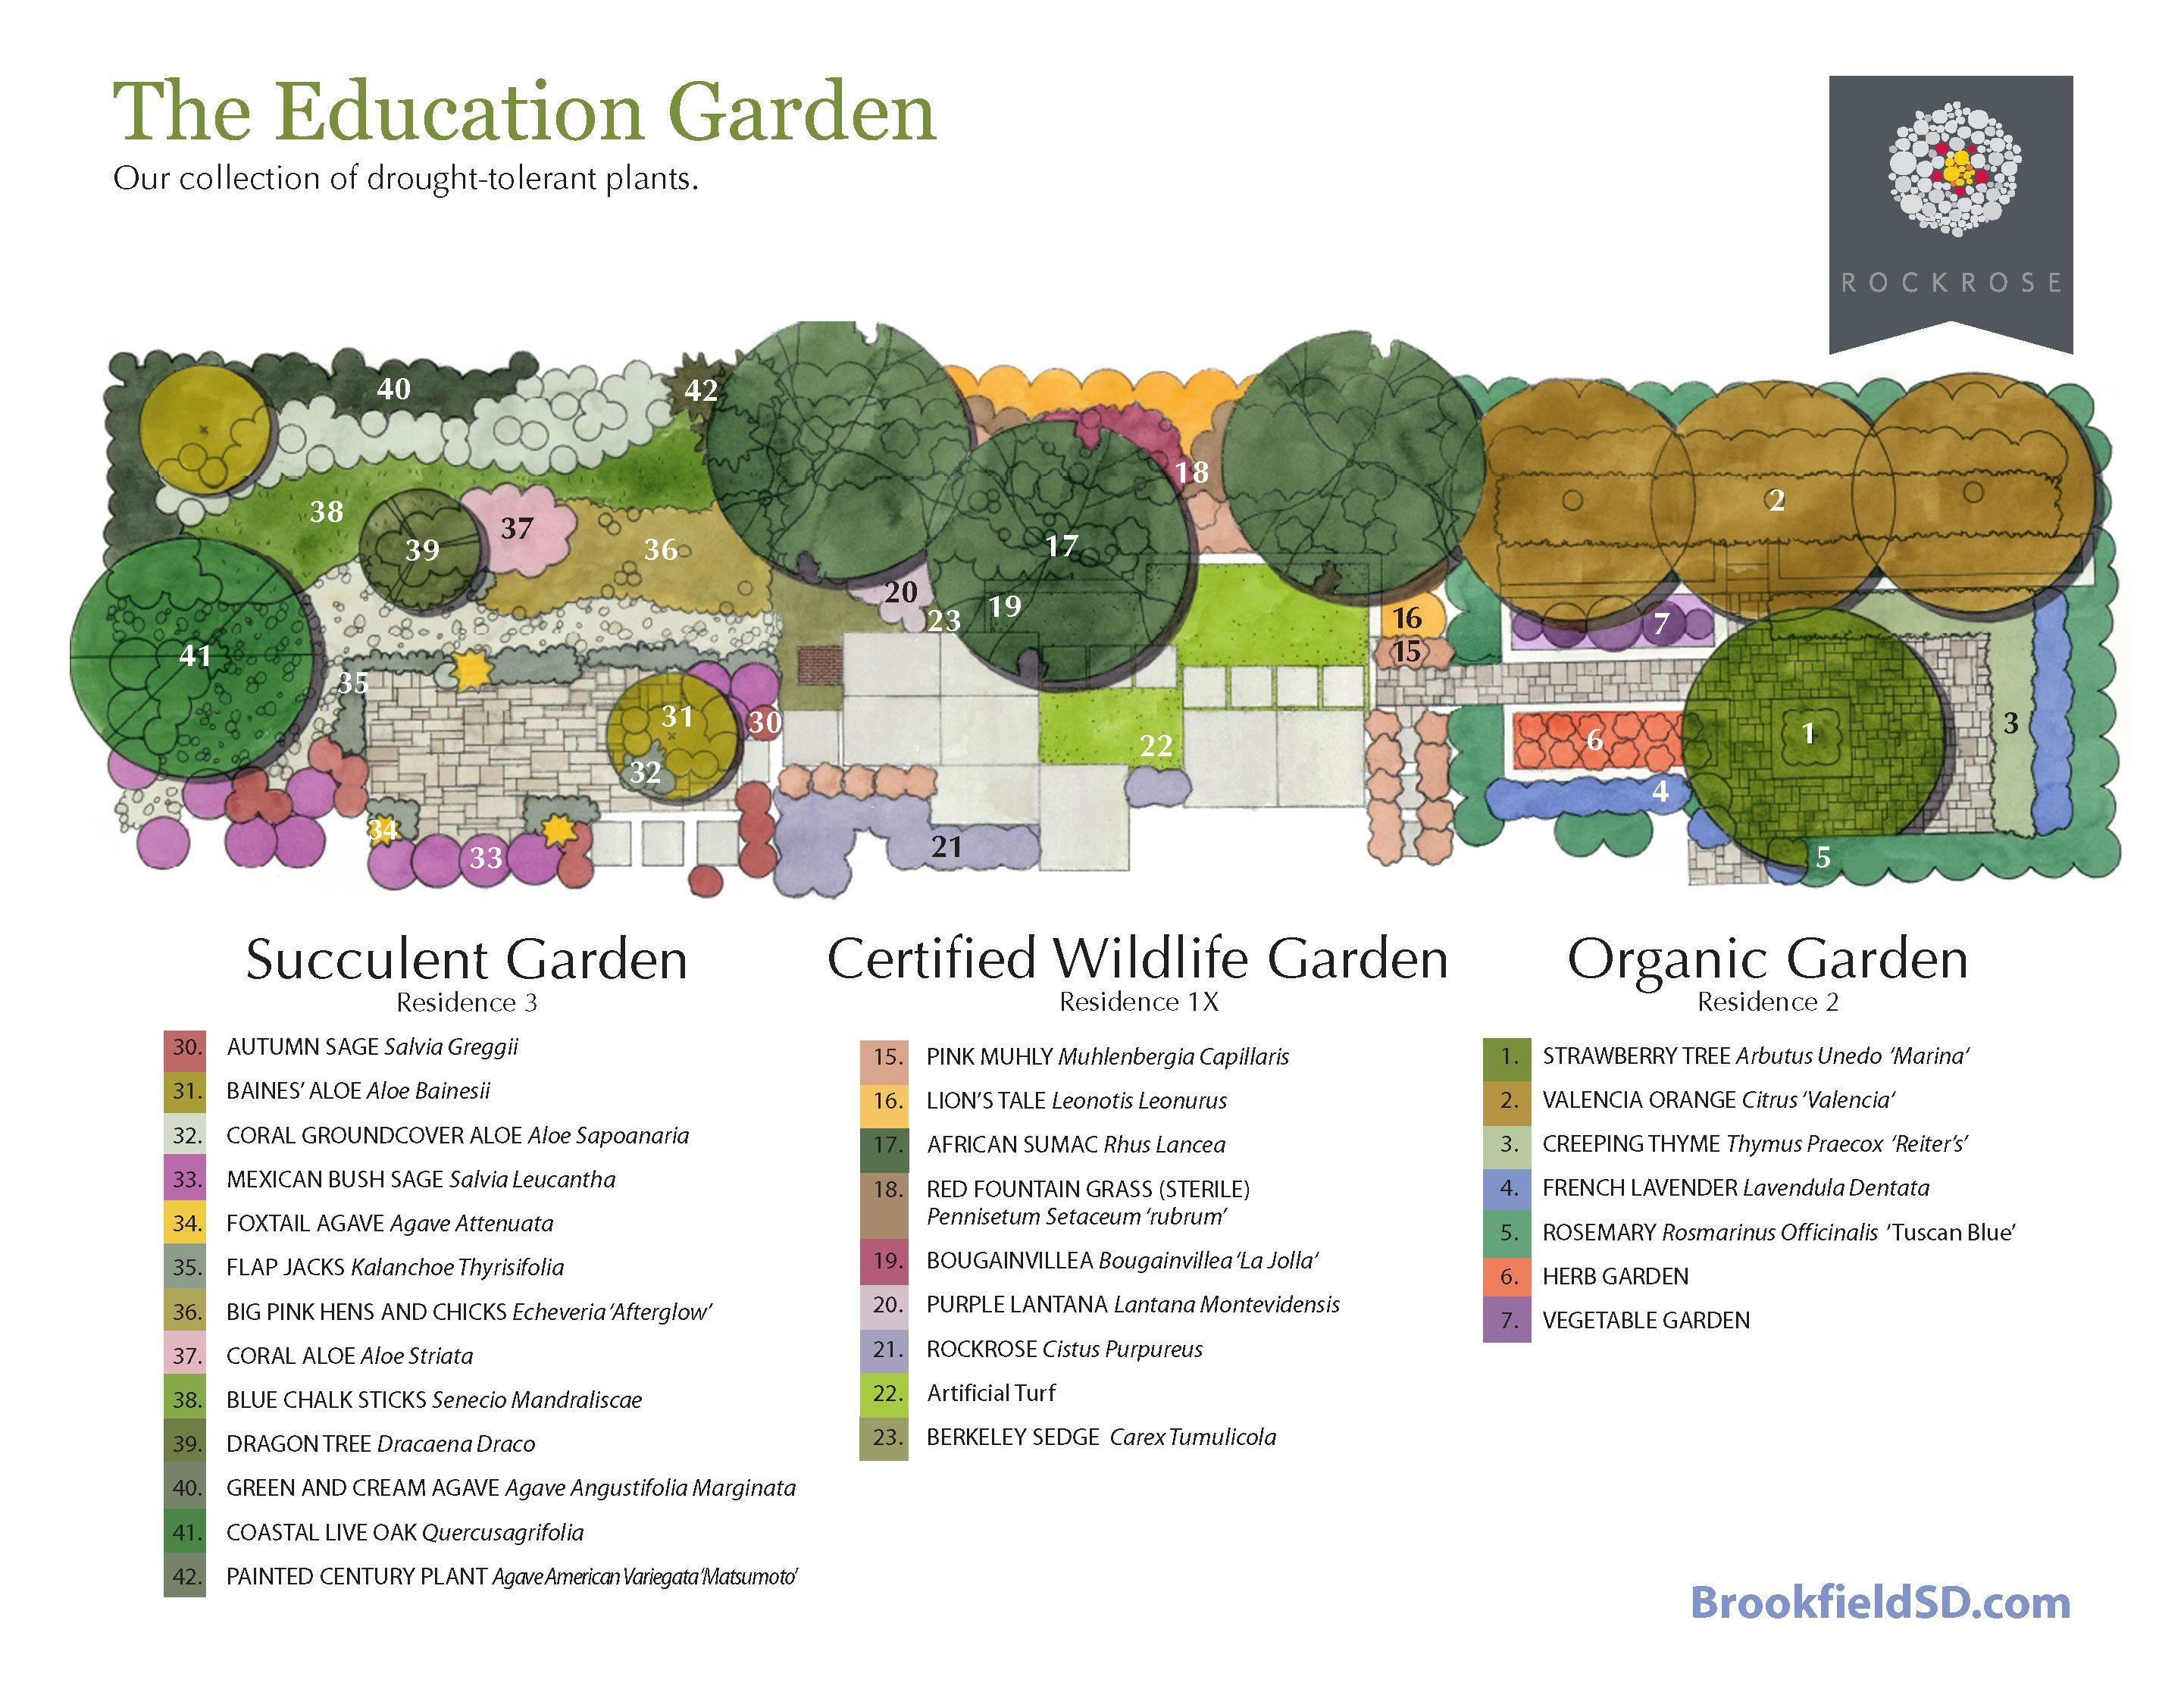 Garden Ideas. 3 concepts shared.  A succulent garden, an organic garden, and a certified wildlife garden.